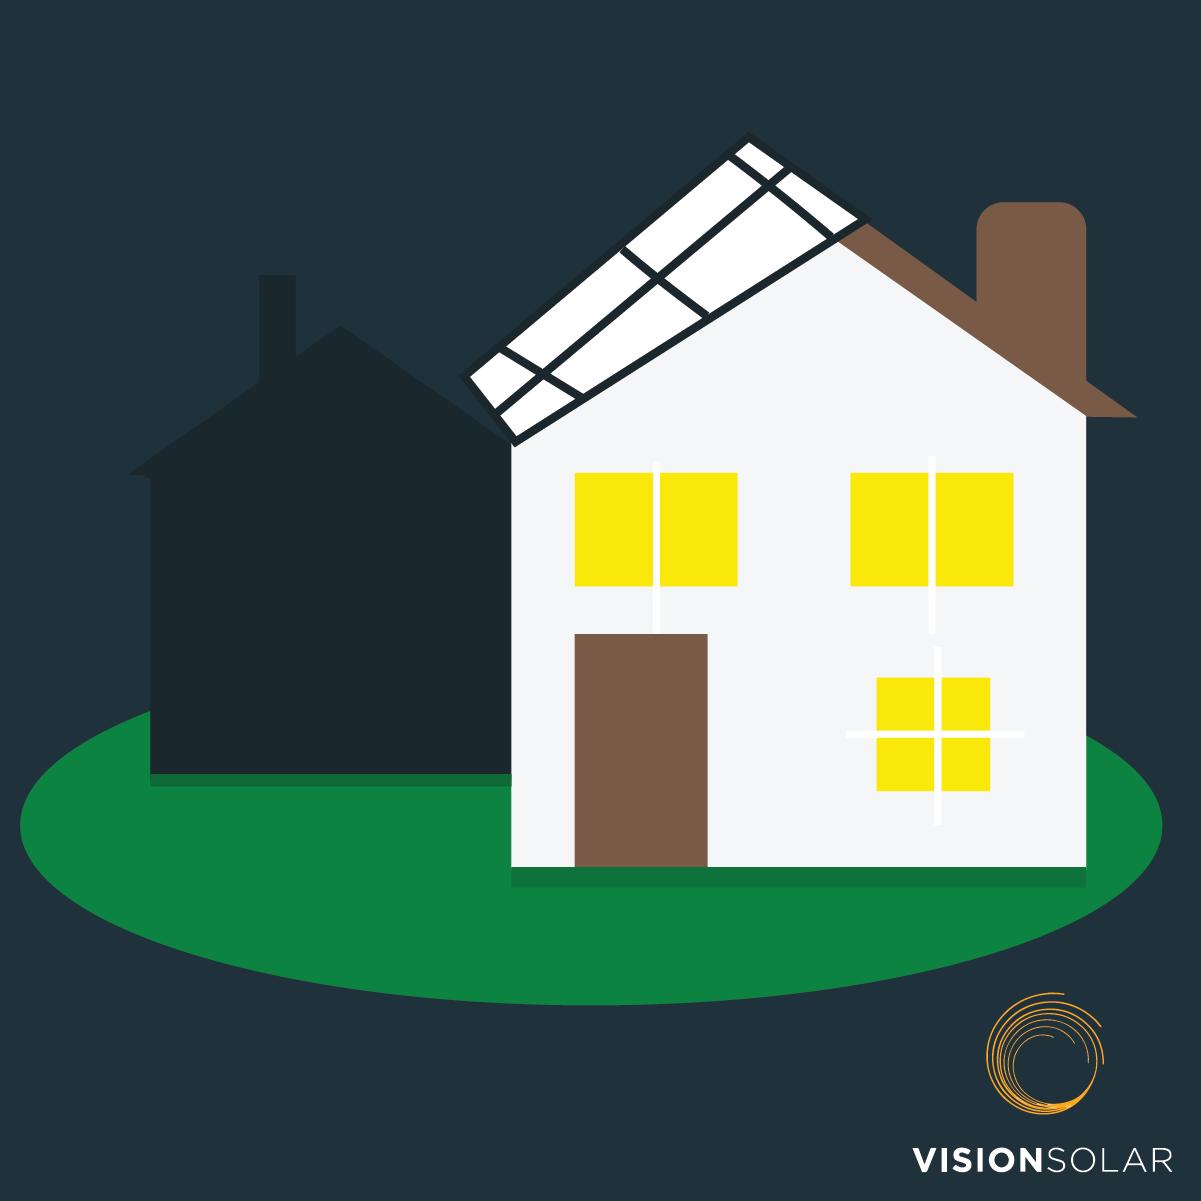 Vision Solar : Neighbors Going Solar